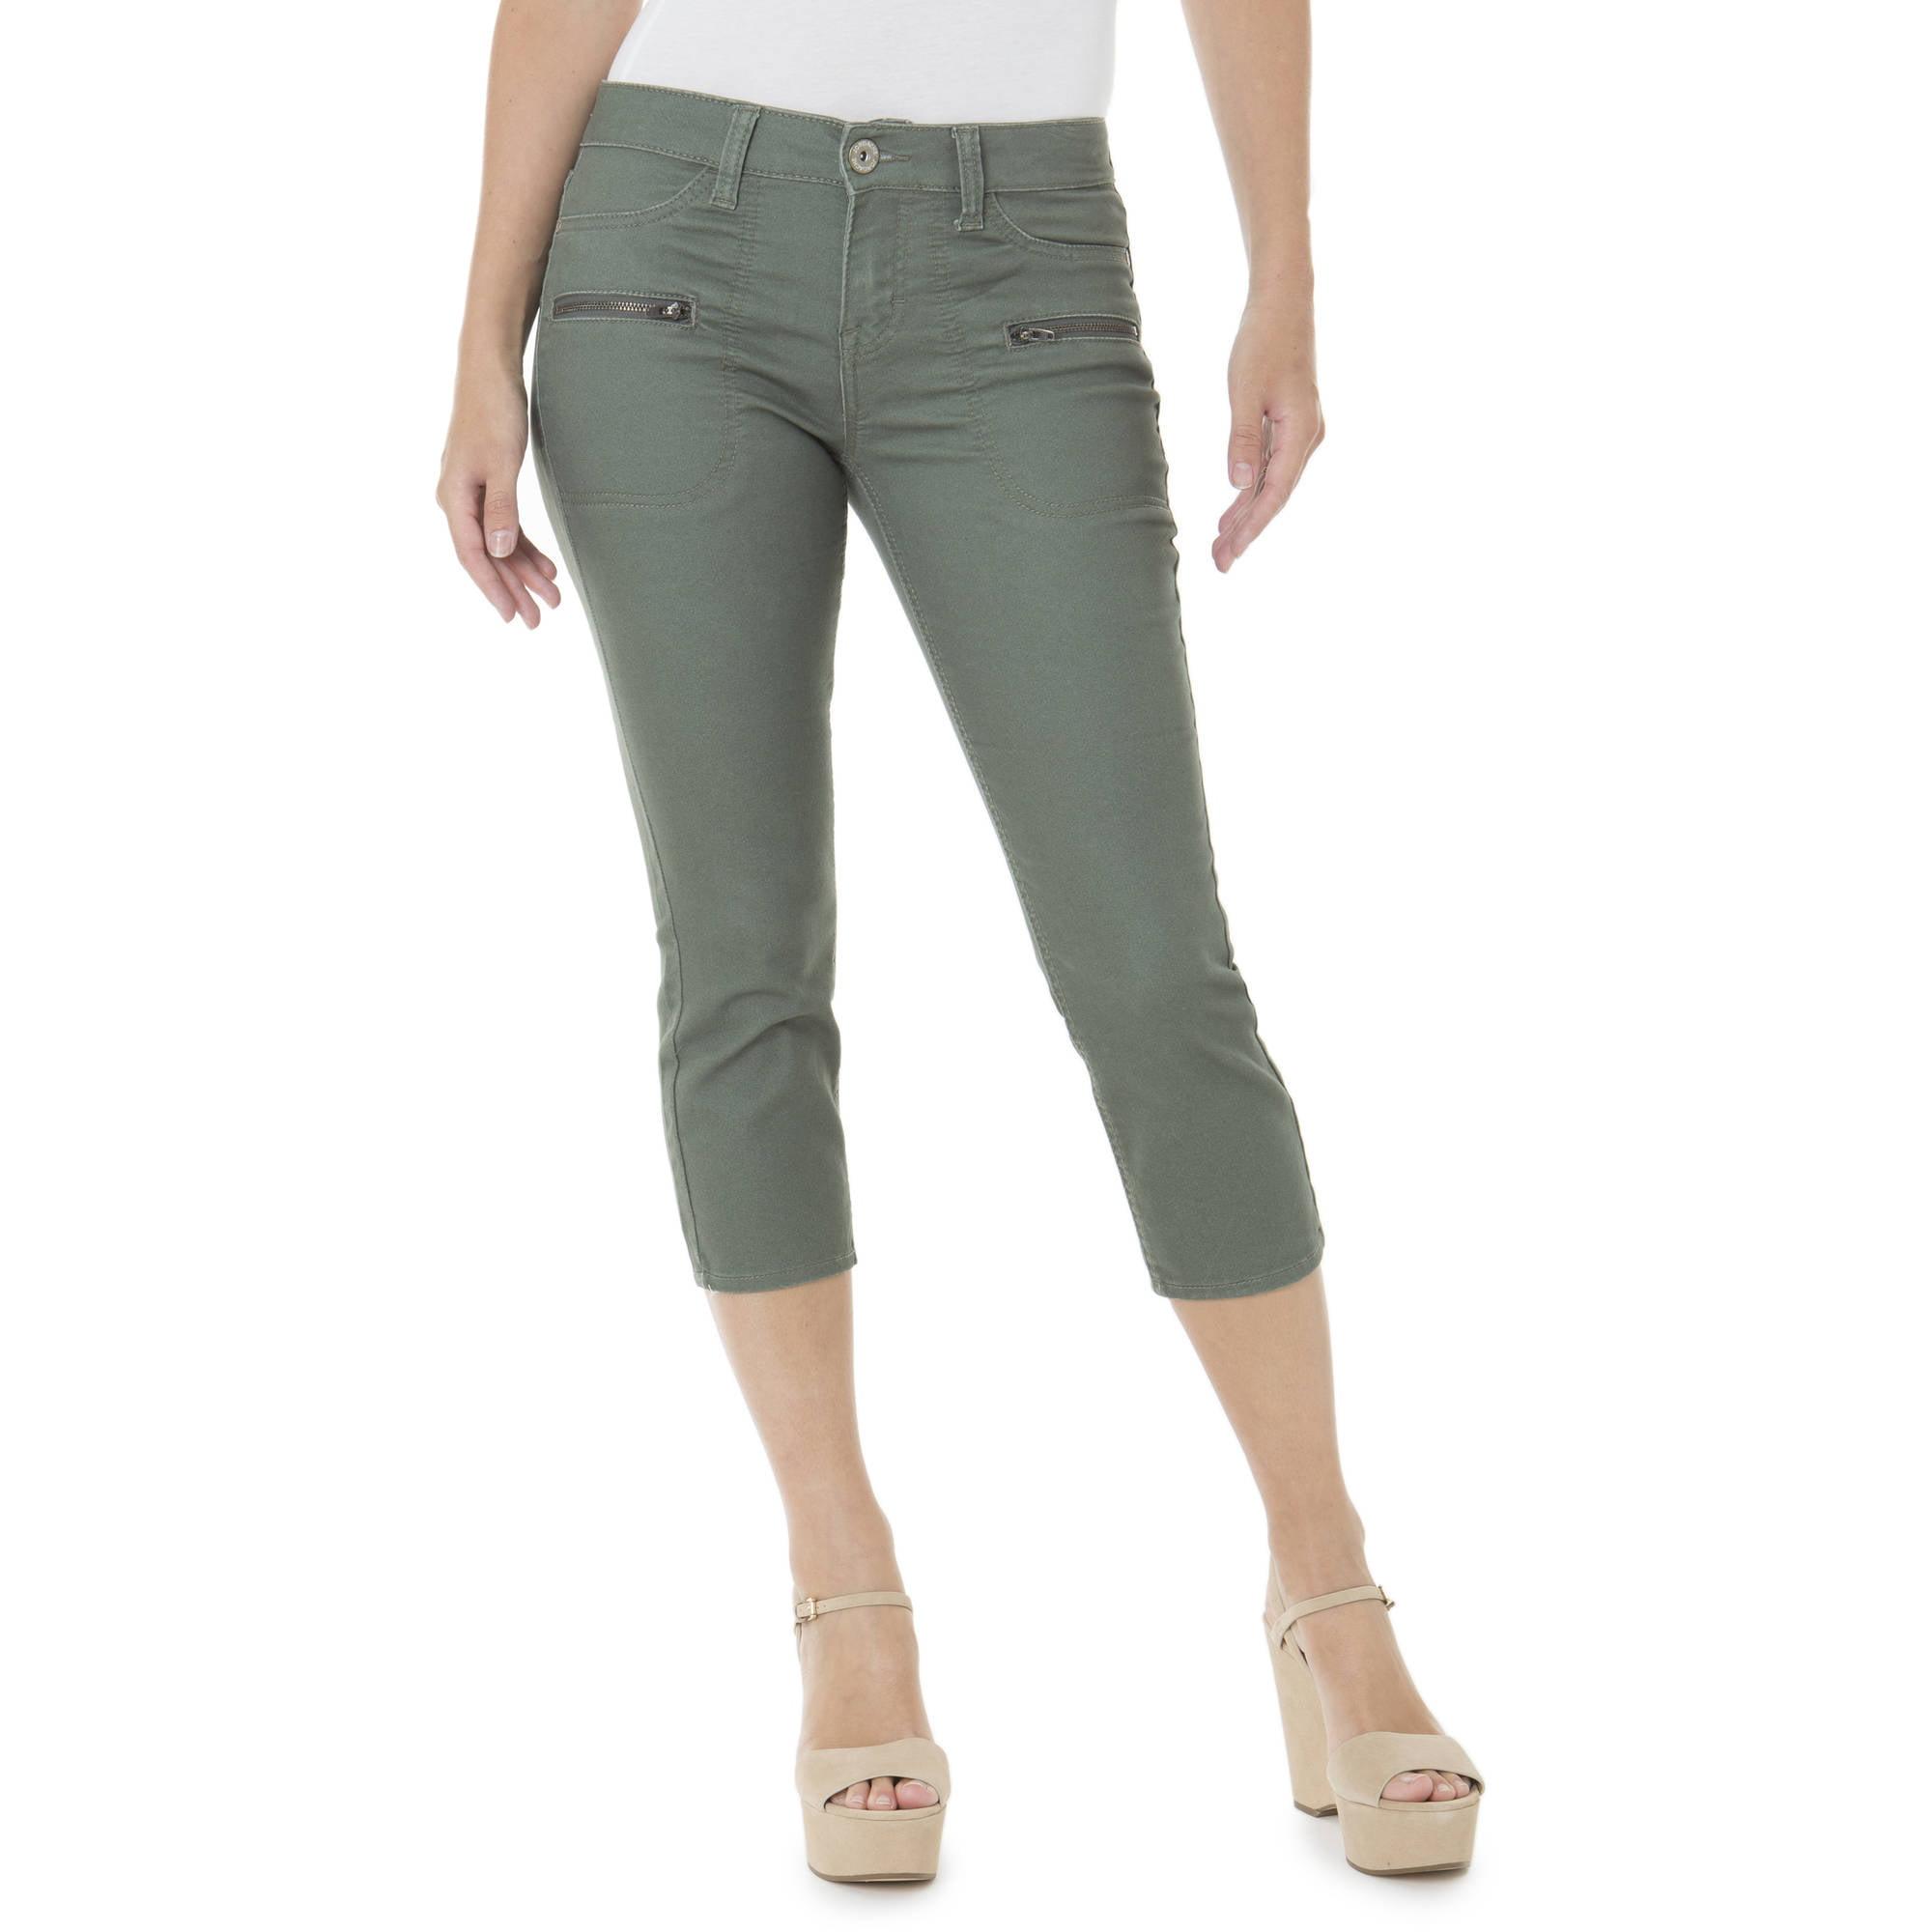 Jordache Women's Moto Capri Jeans - Walmart.com